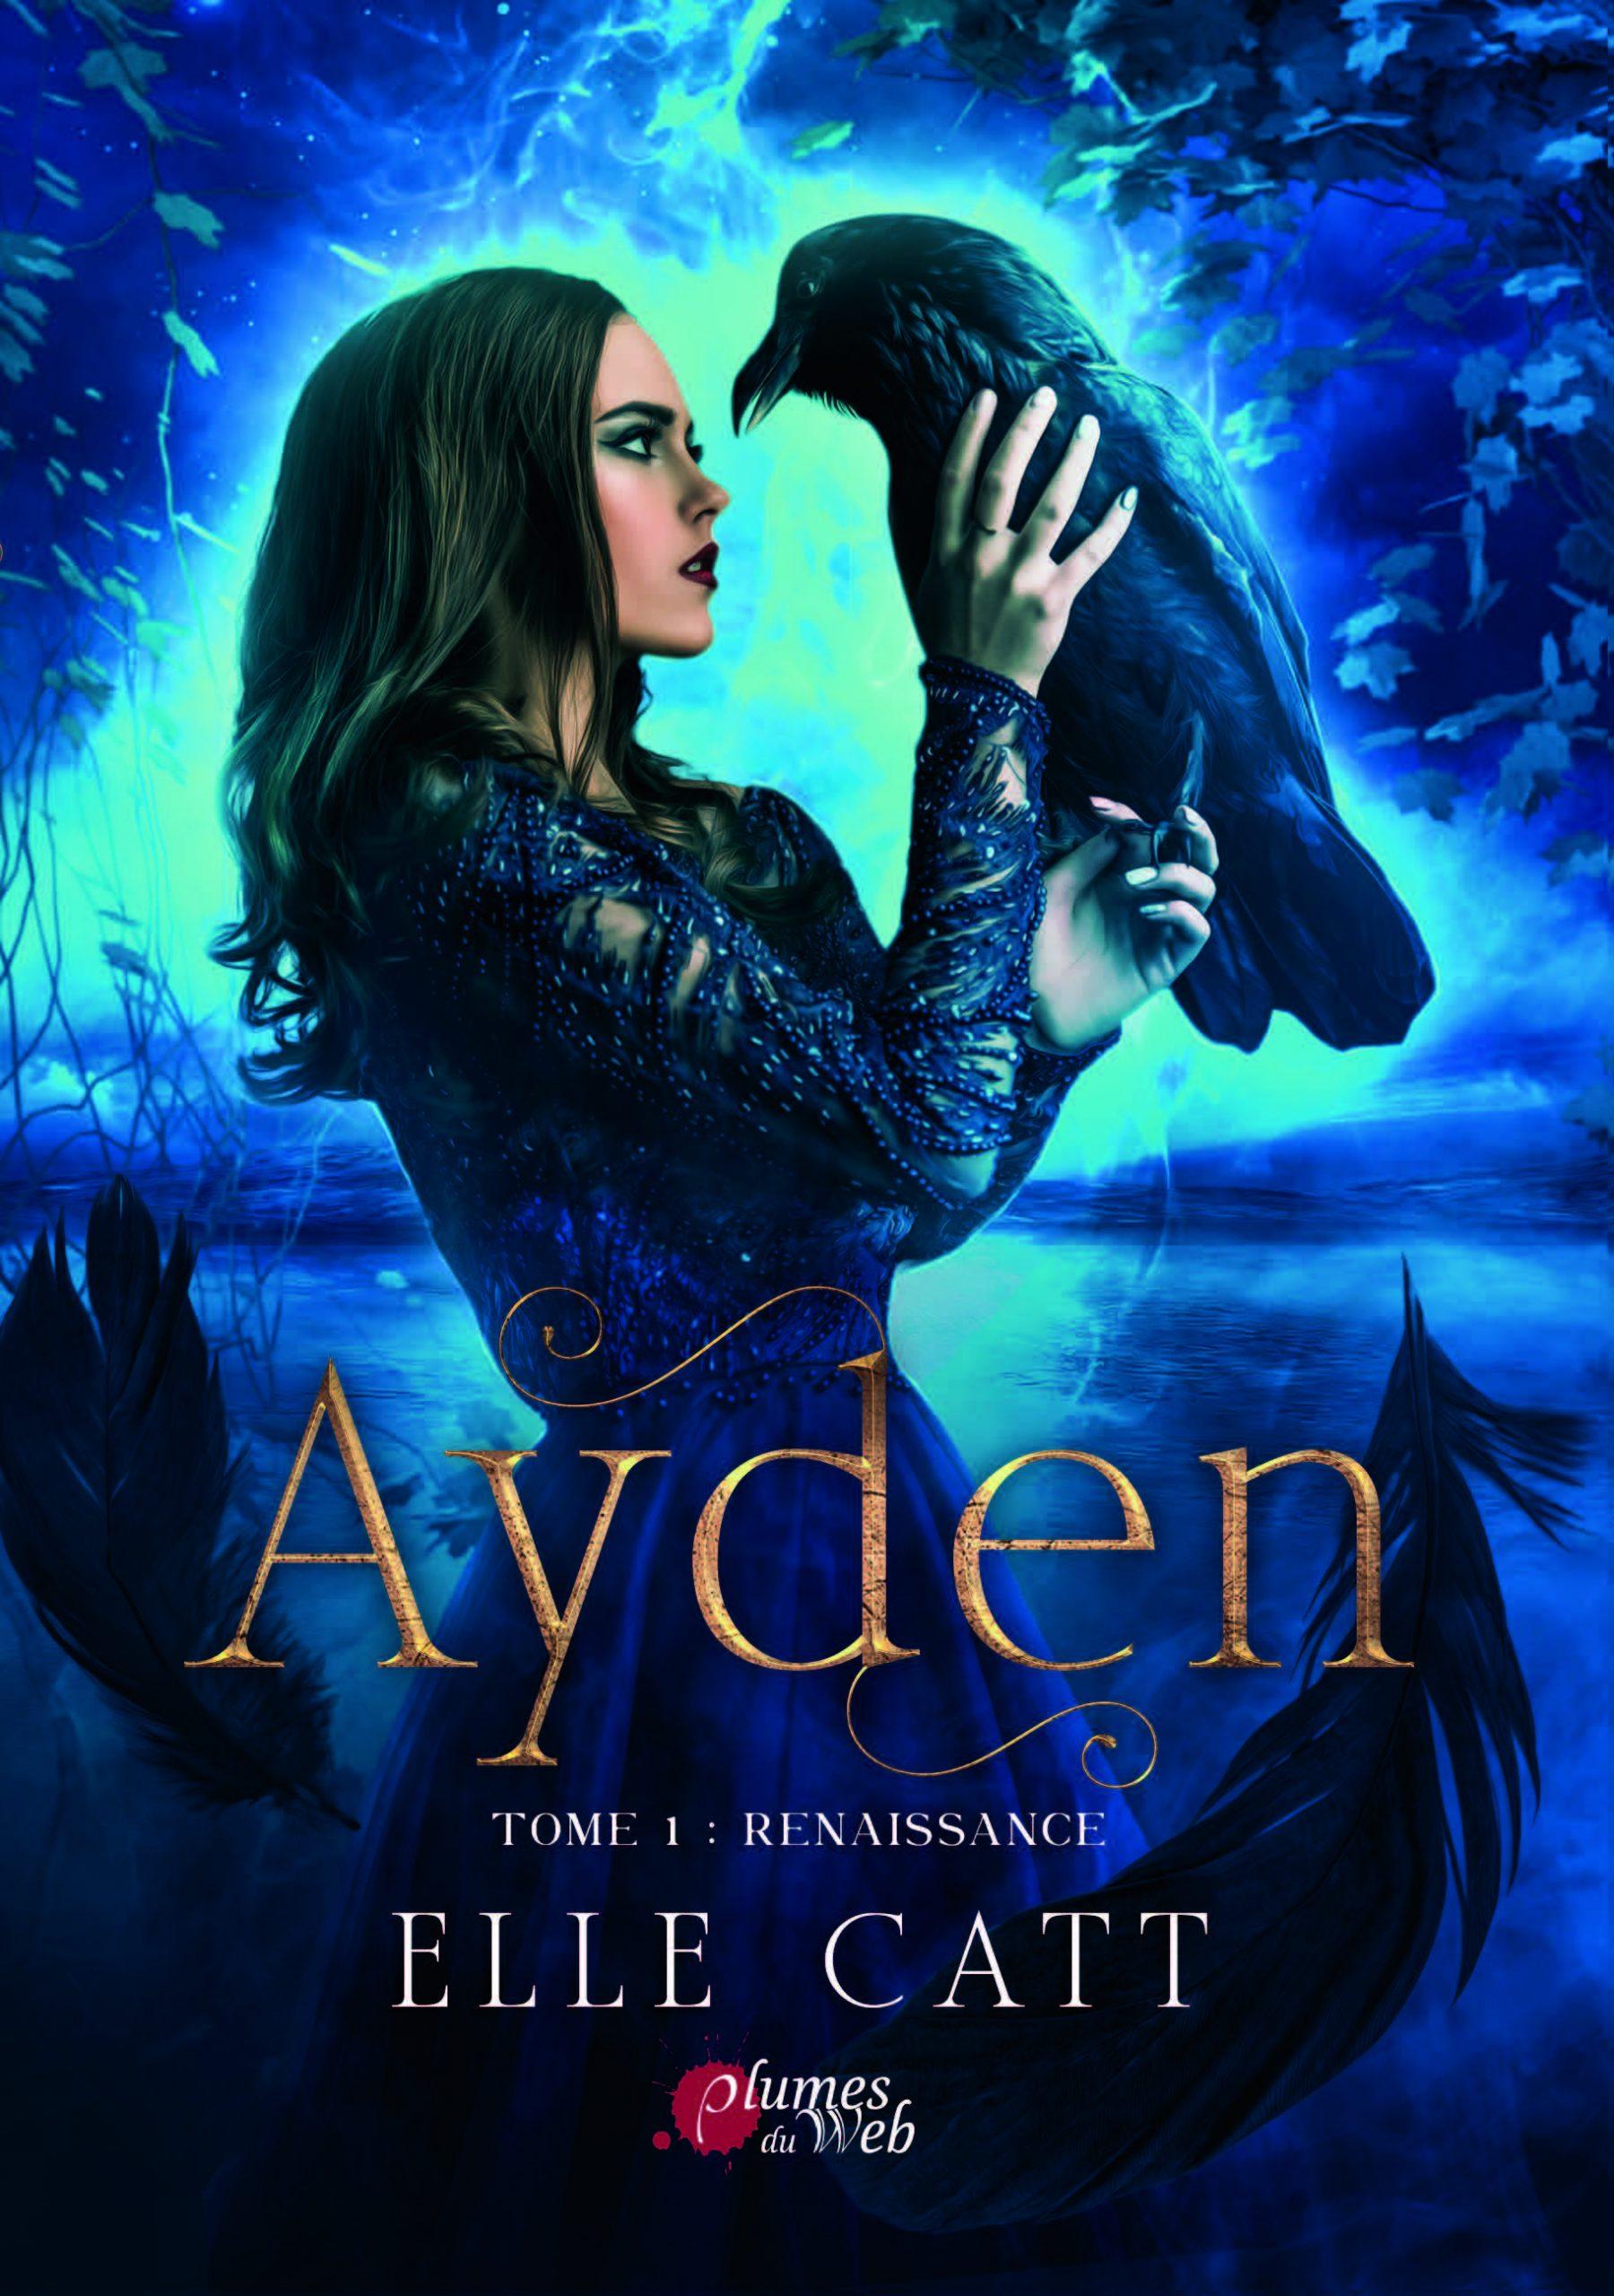 AYDEN #1 Renaissance